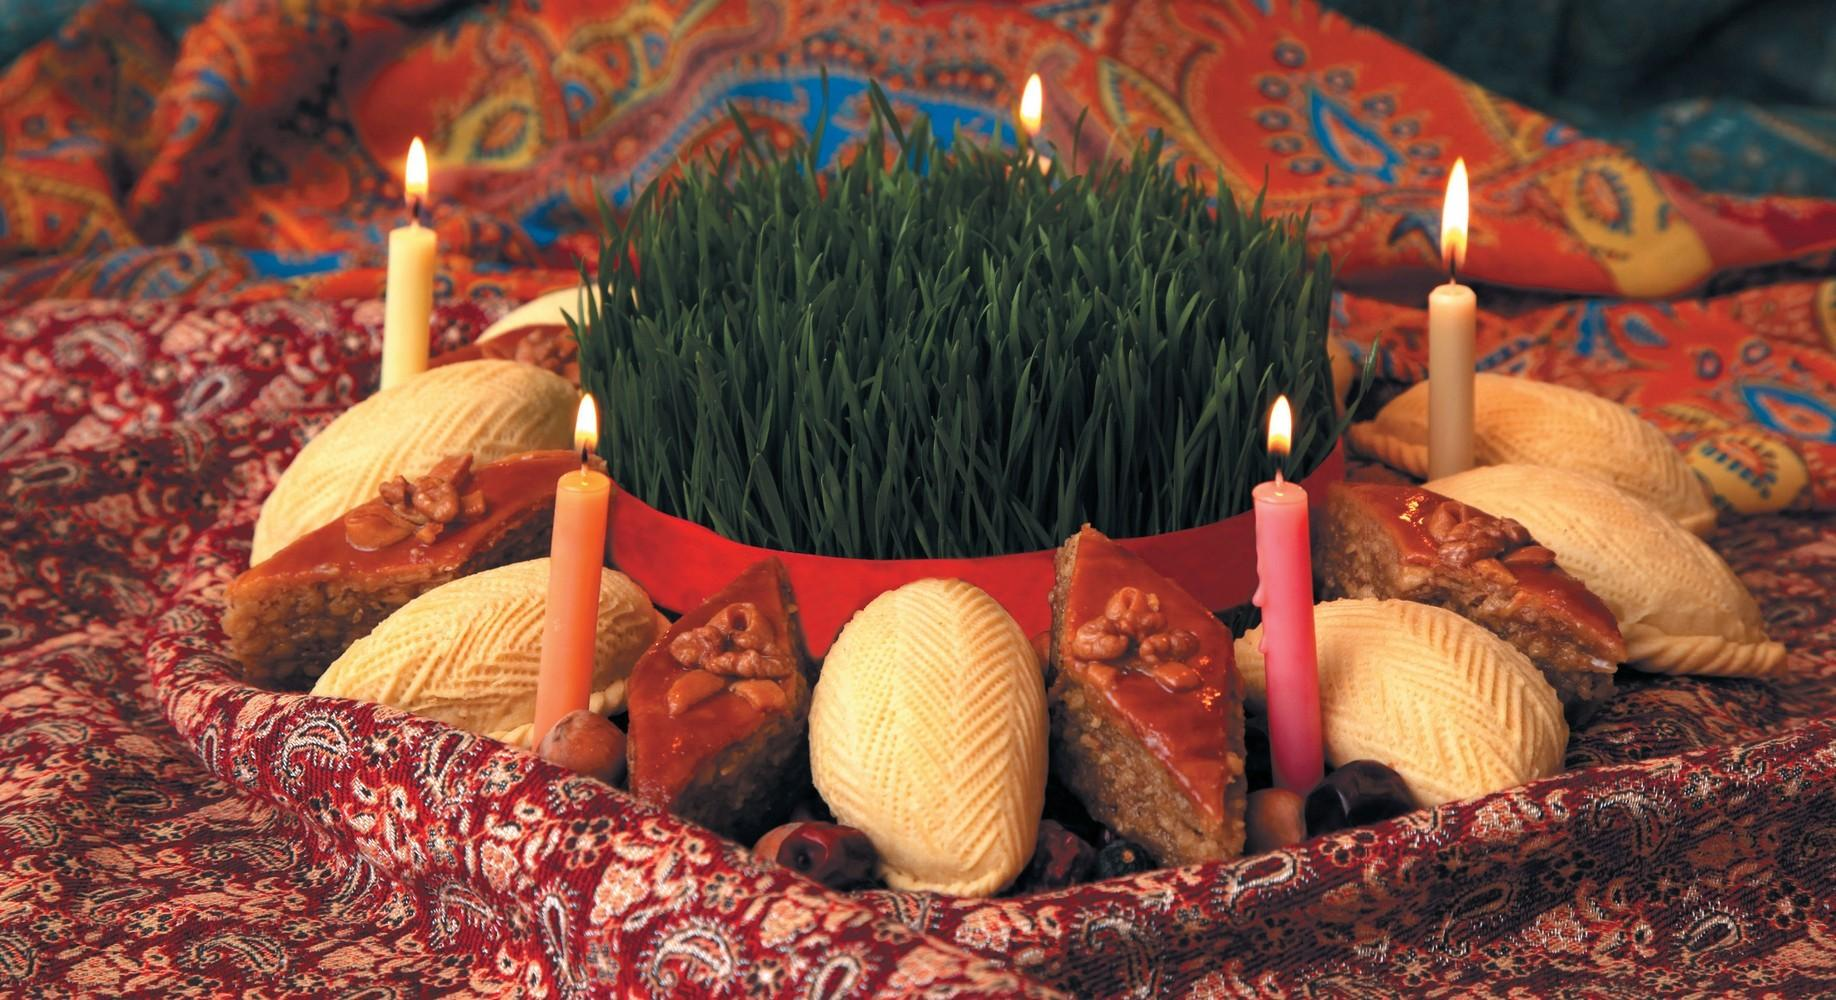 Azerbaijan celebrates the Last Tuesday before Novruz